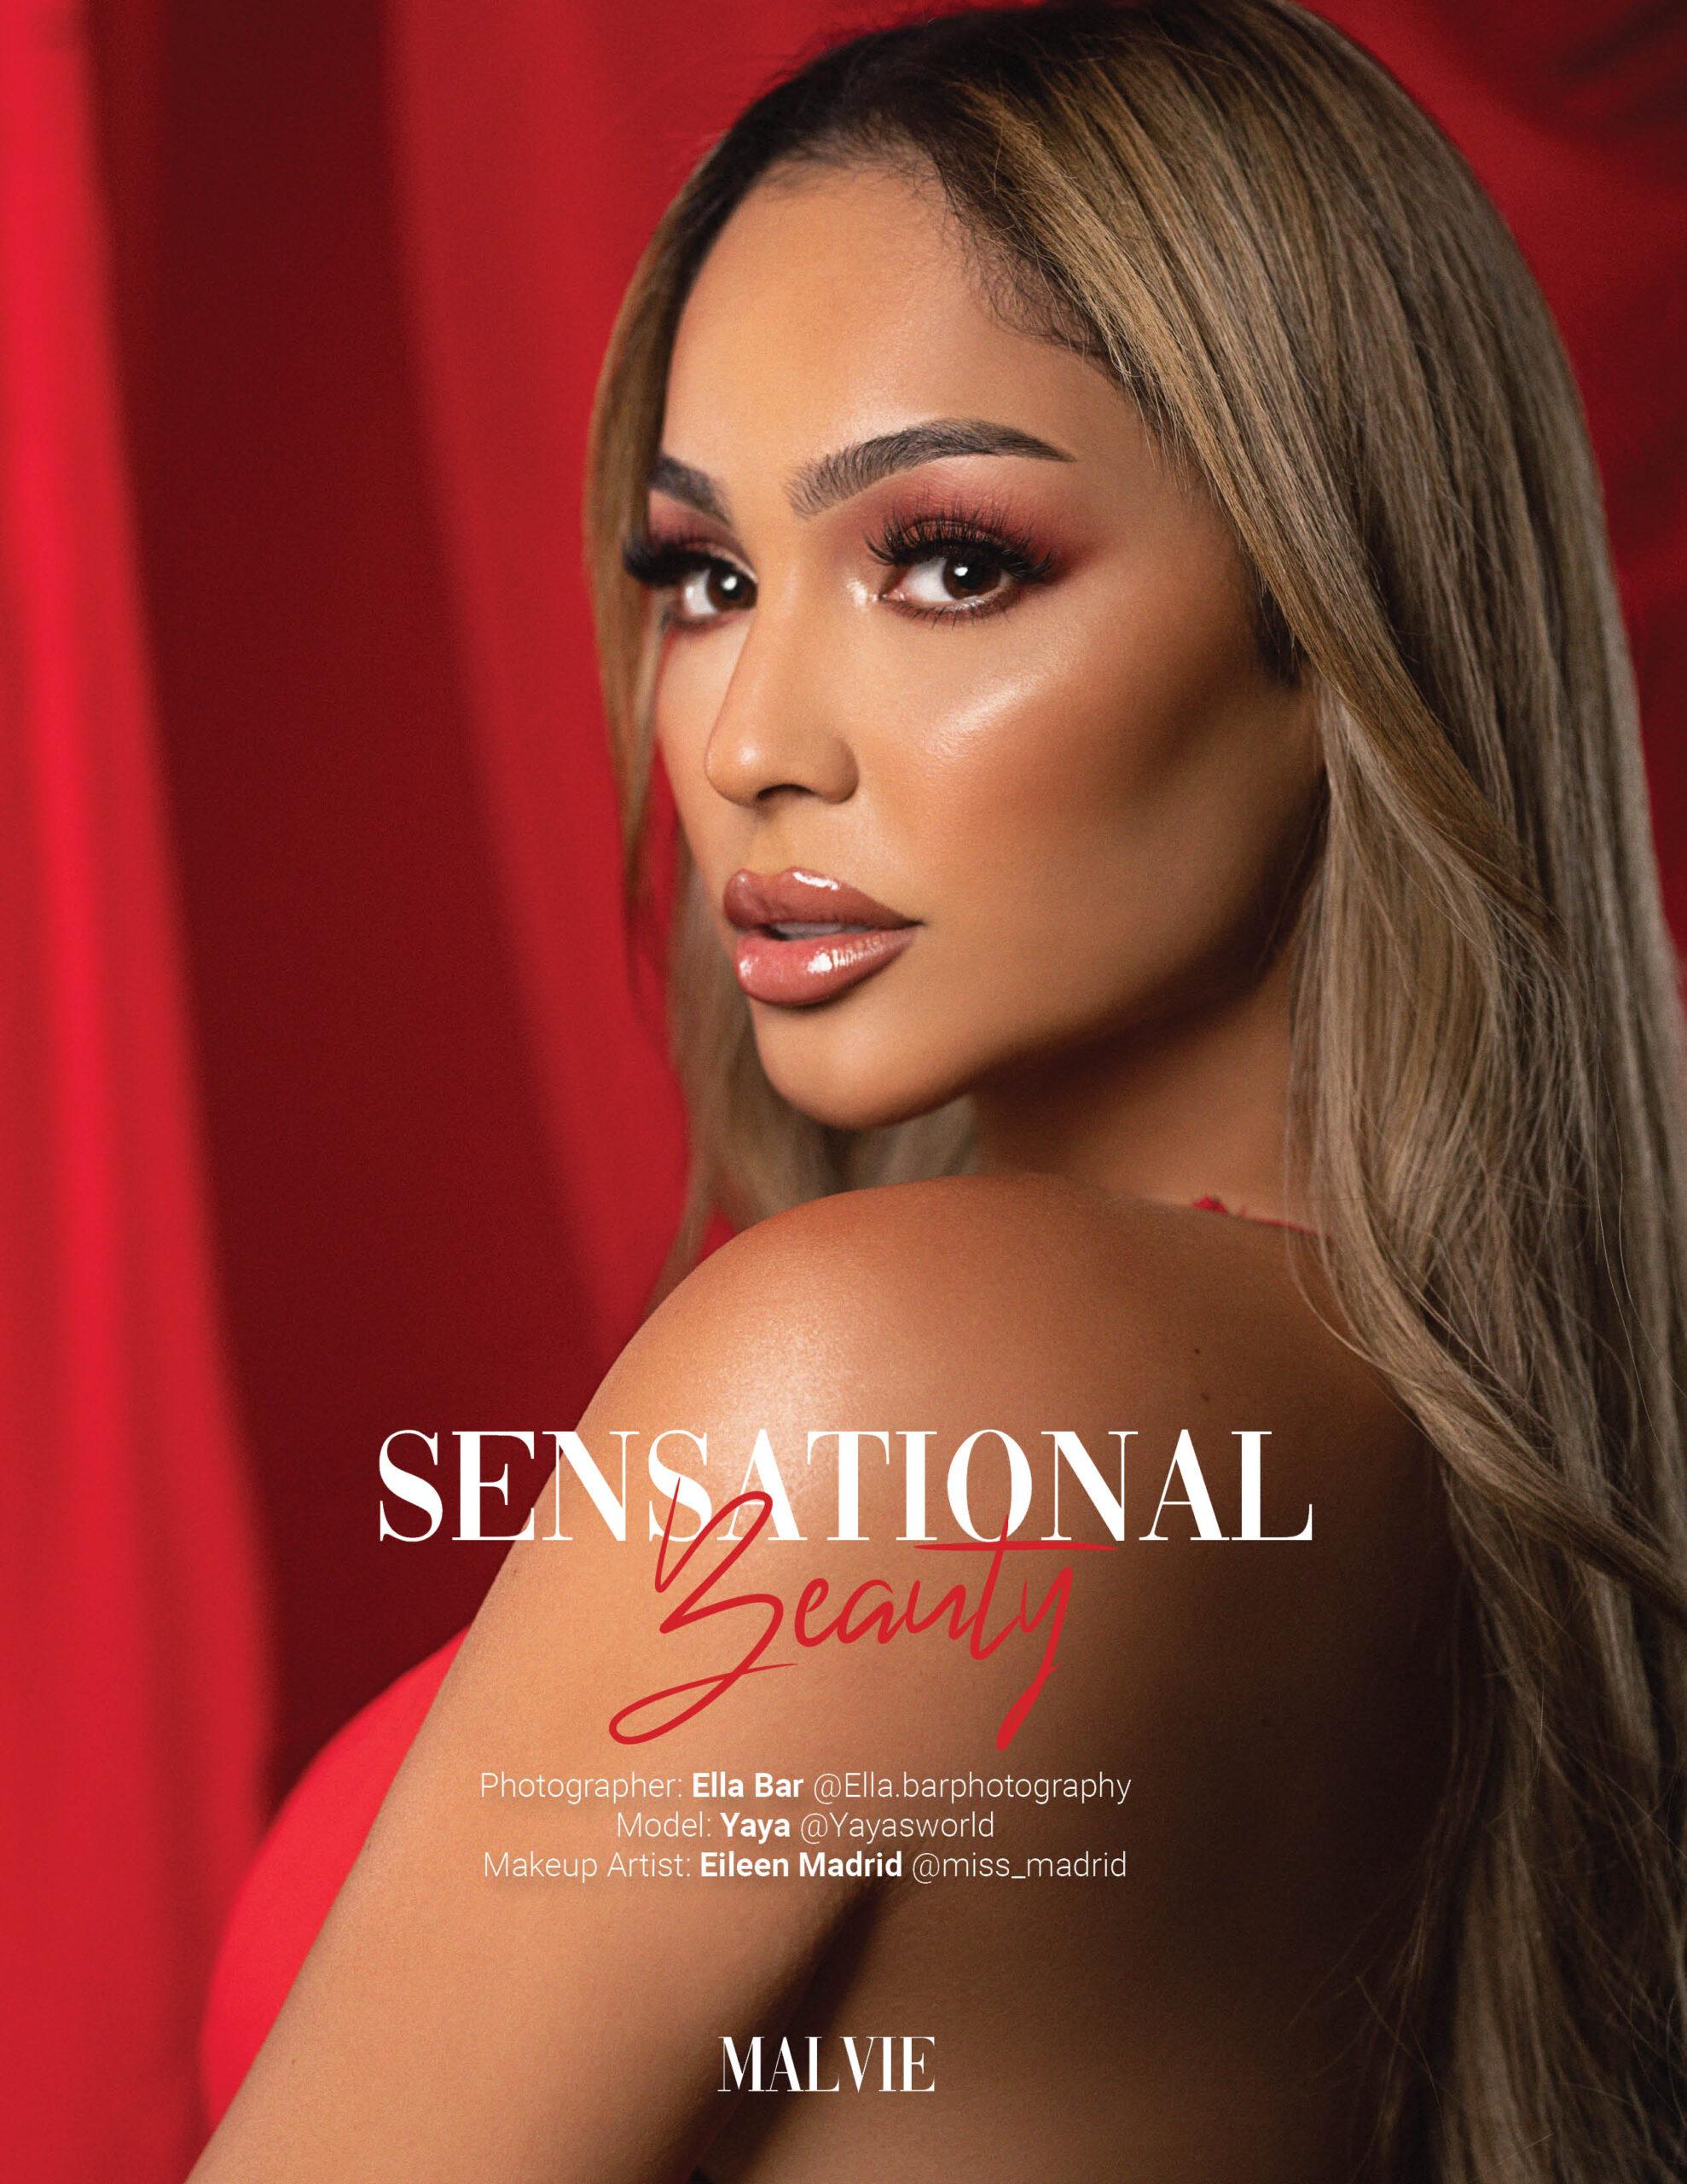 MALVIE Magazine The Artist Edition Vol 128 January 2021 40